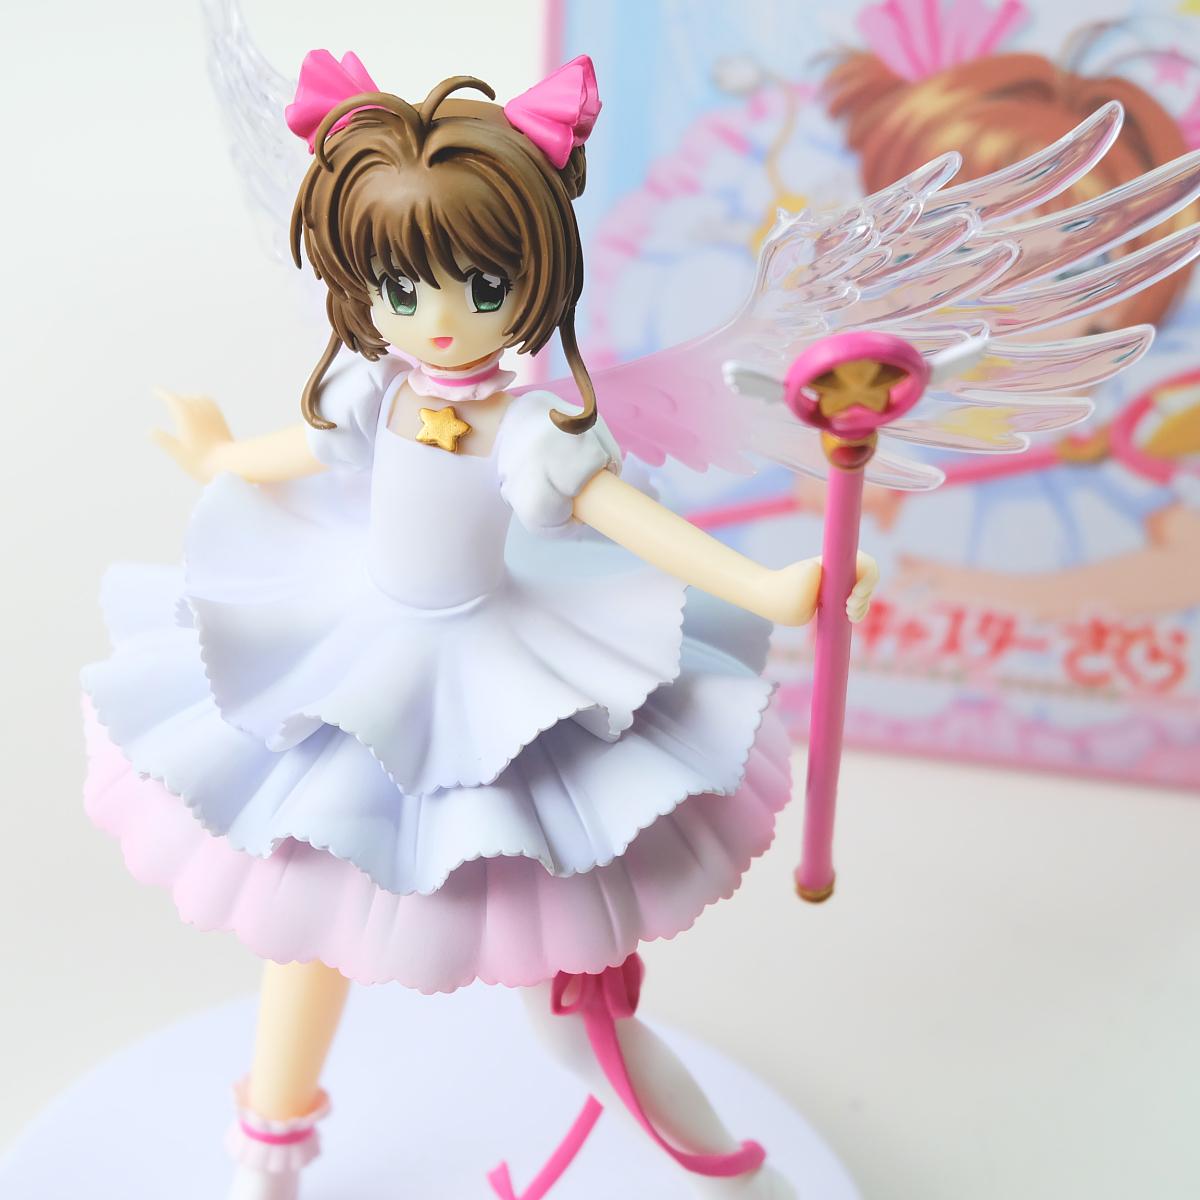 DSCF3325 kawaii cardcaptor sakura toys rainbowholic shop